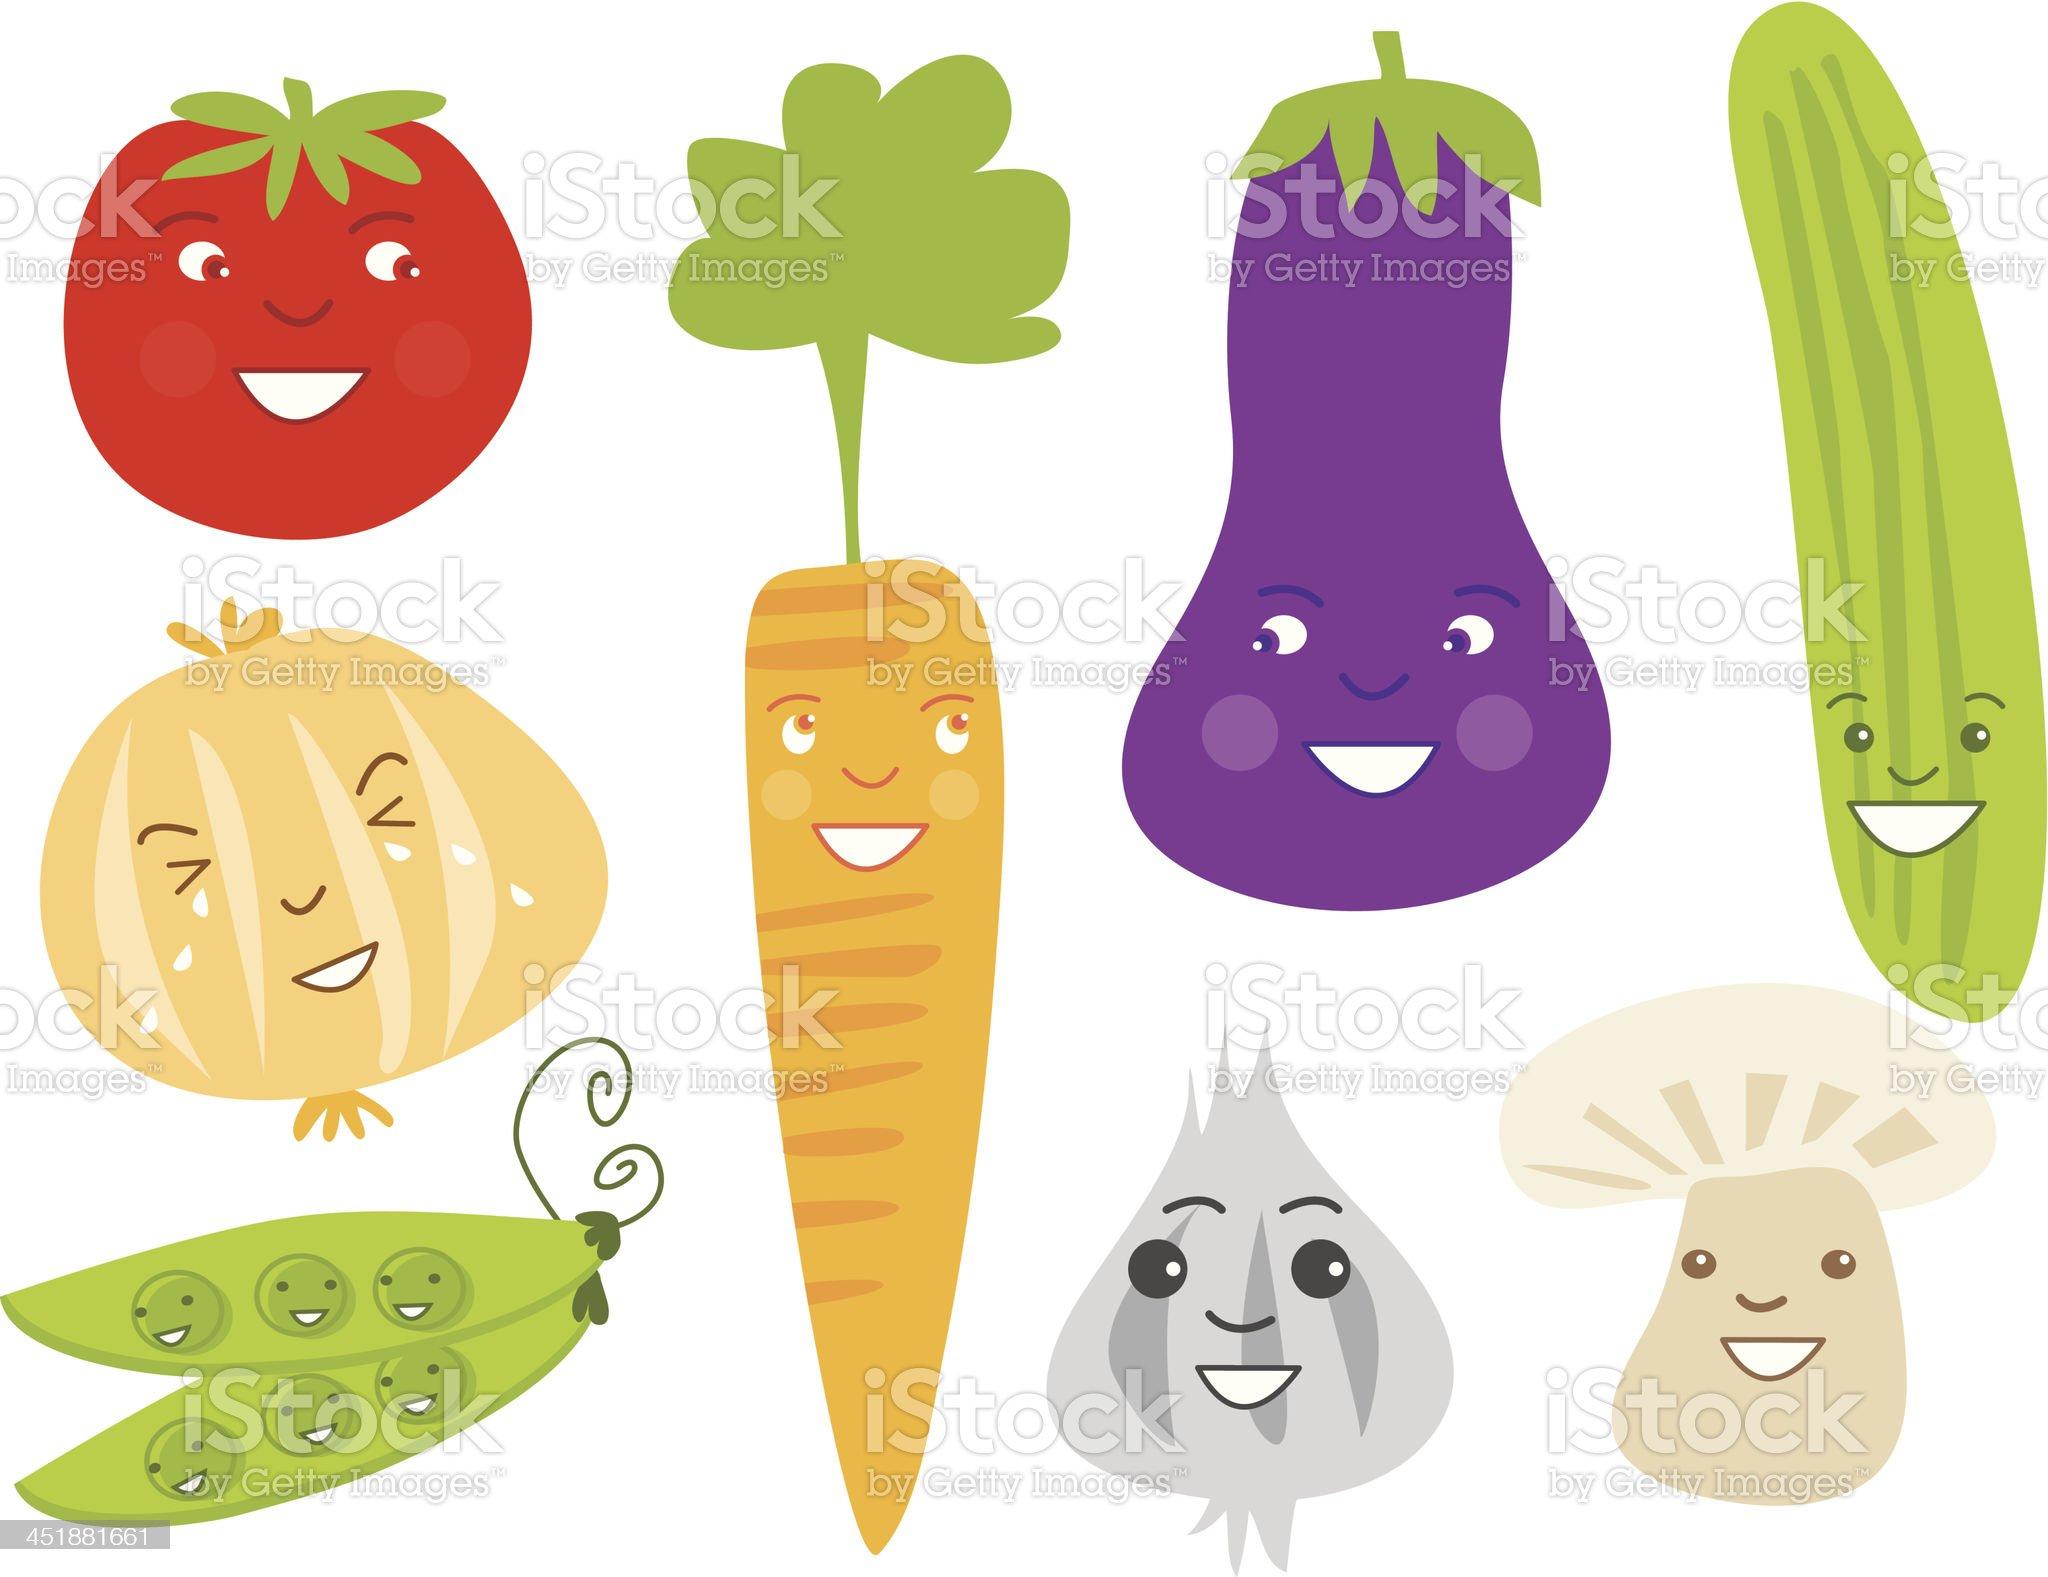 Cute Veggie Characters royalty-free stock vector art